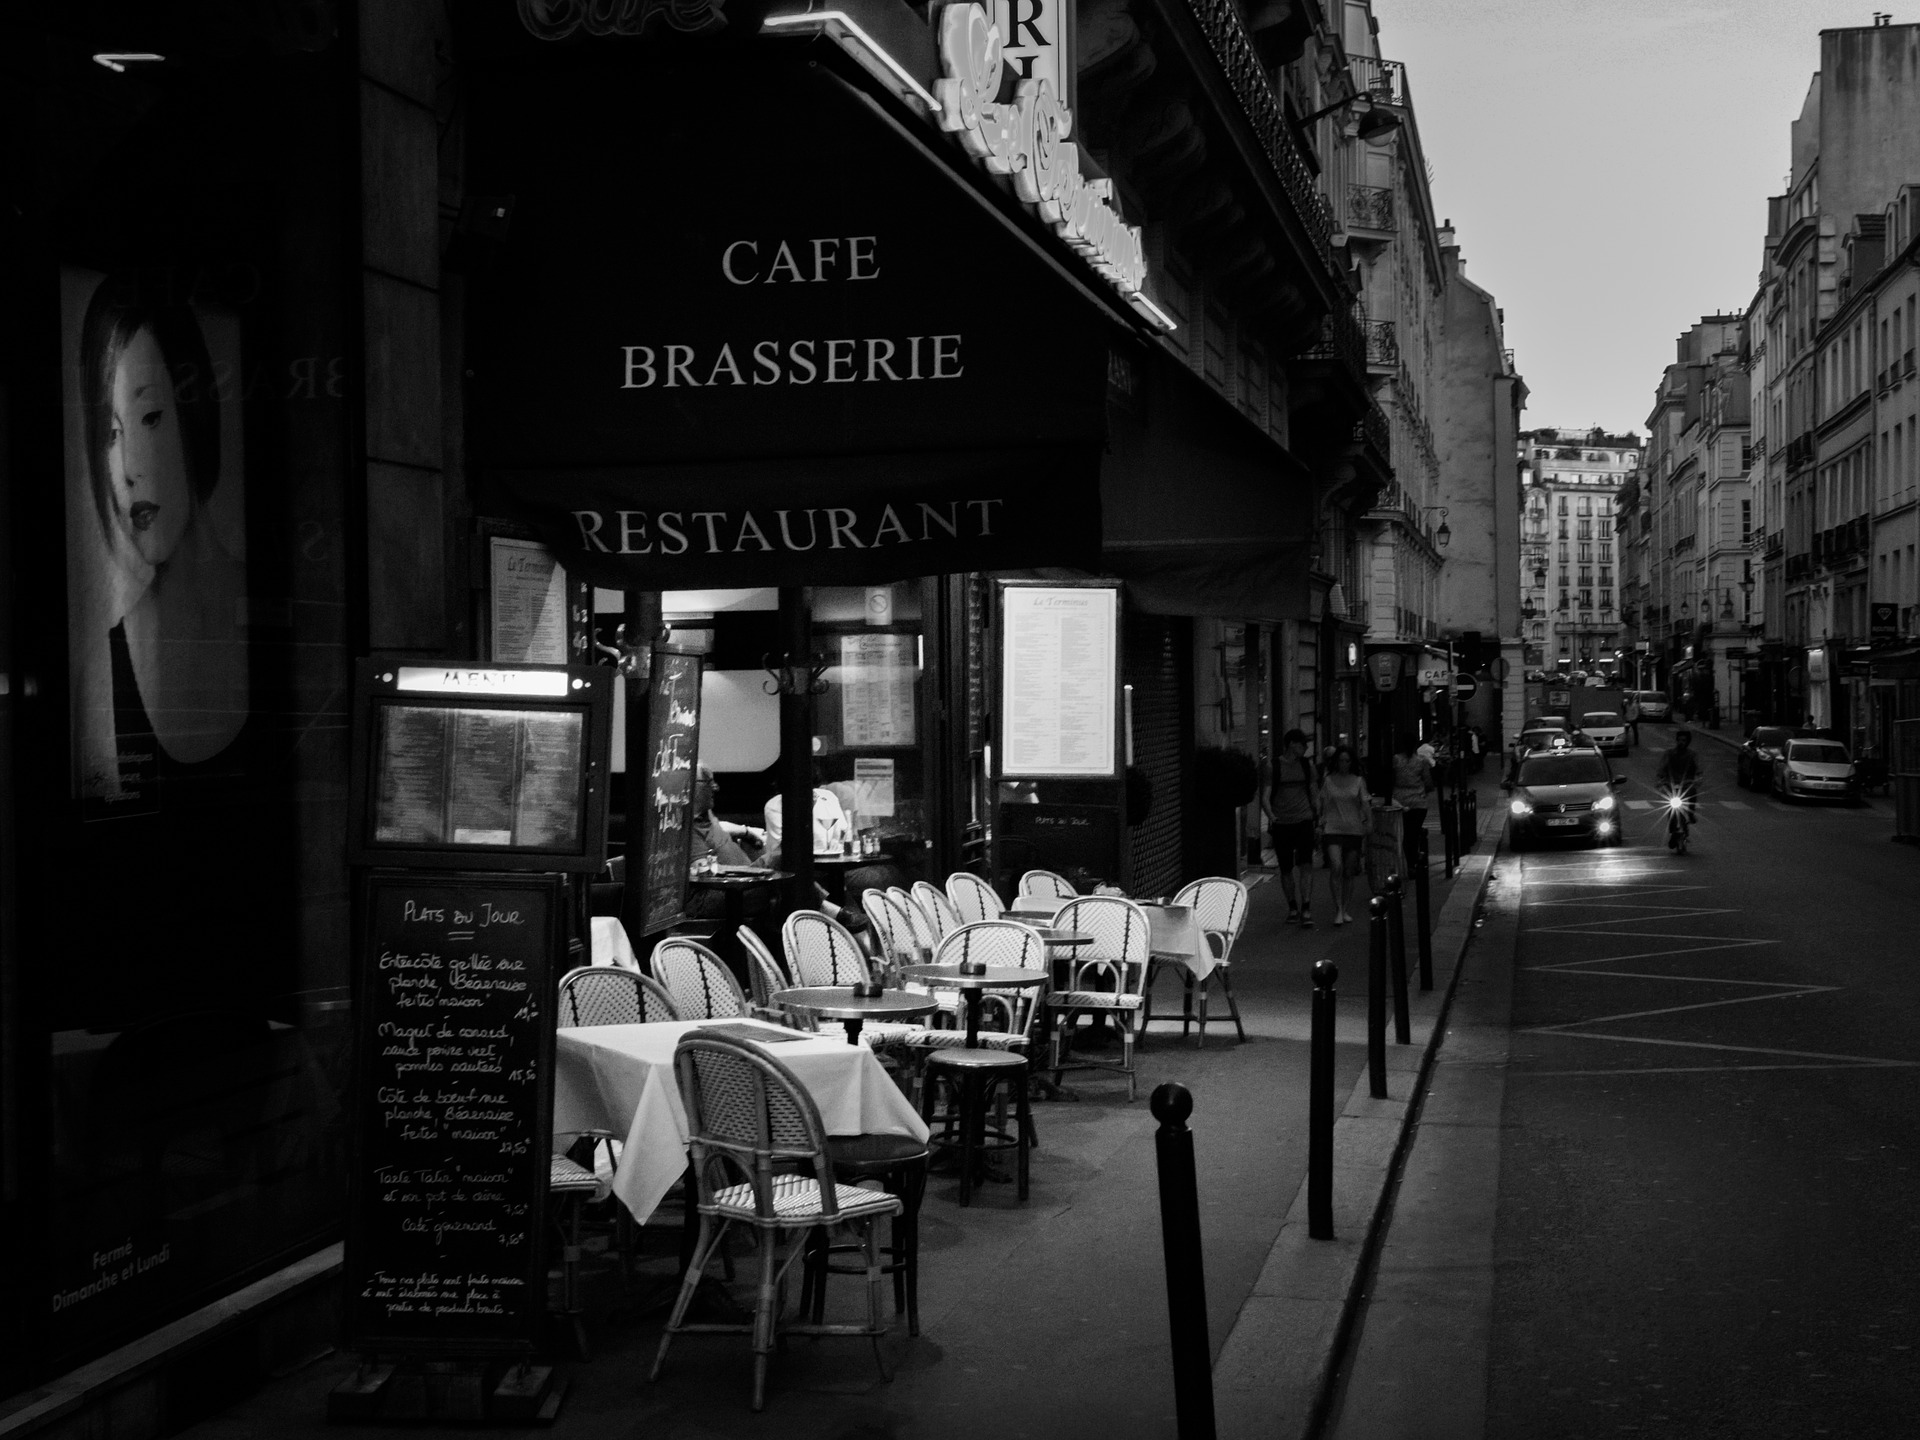 brasserie-1329543_1920